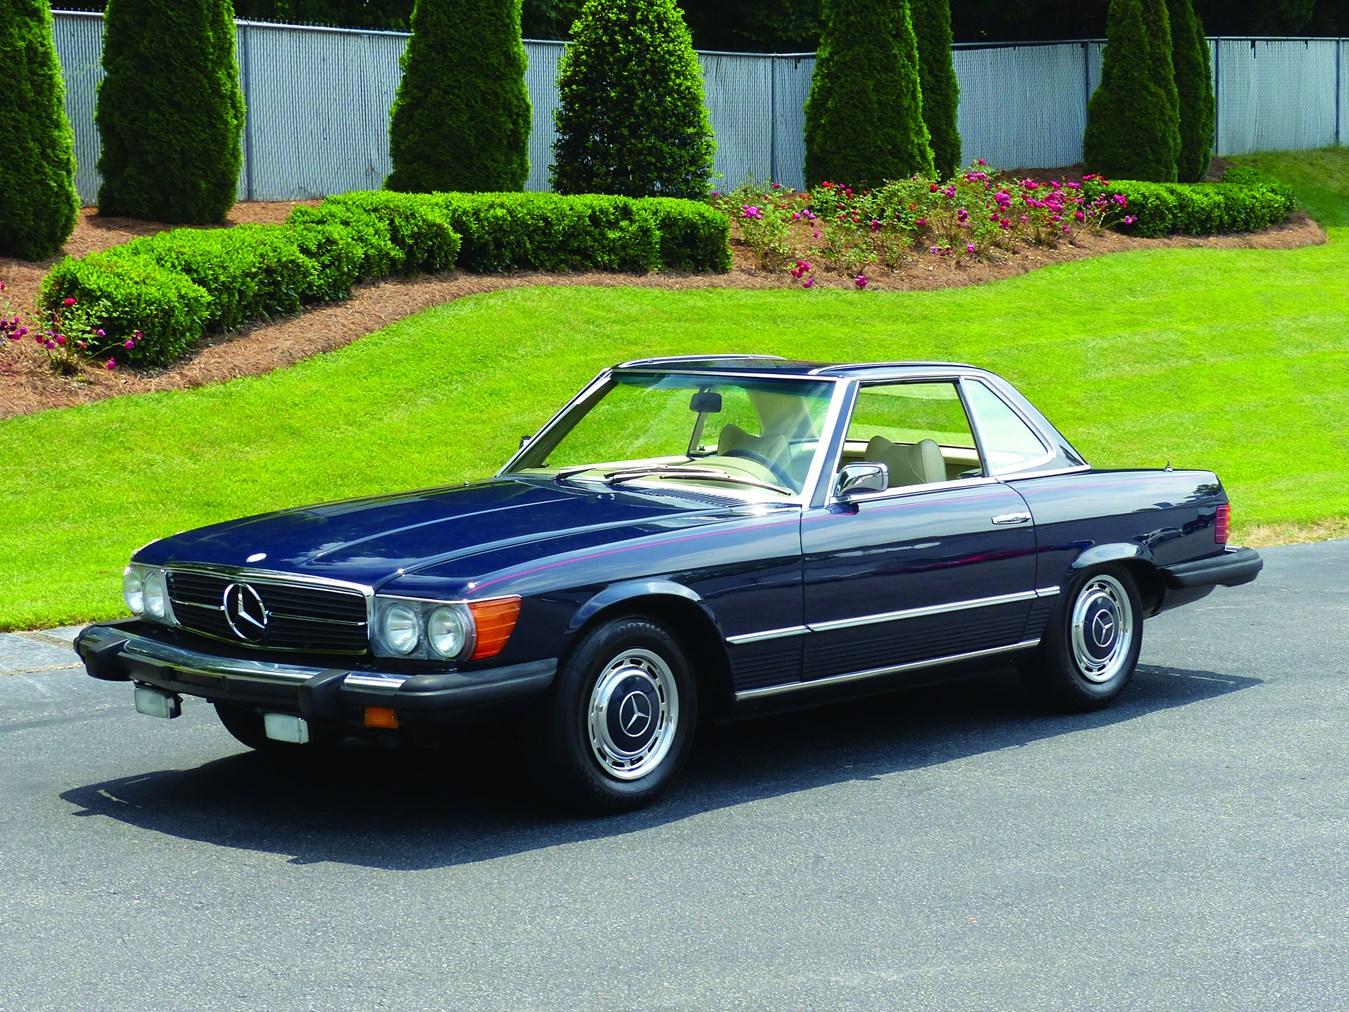 Rm sotheby 39 s 1975 mercedes benz 450sl hilton head 2016 for Mercedes benz of hilton head